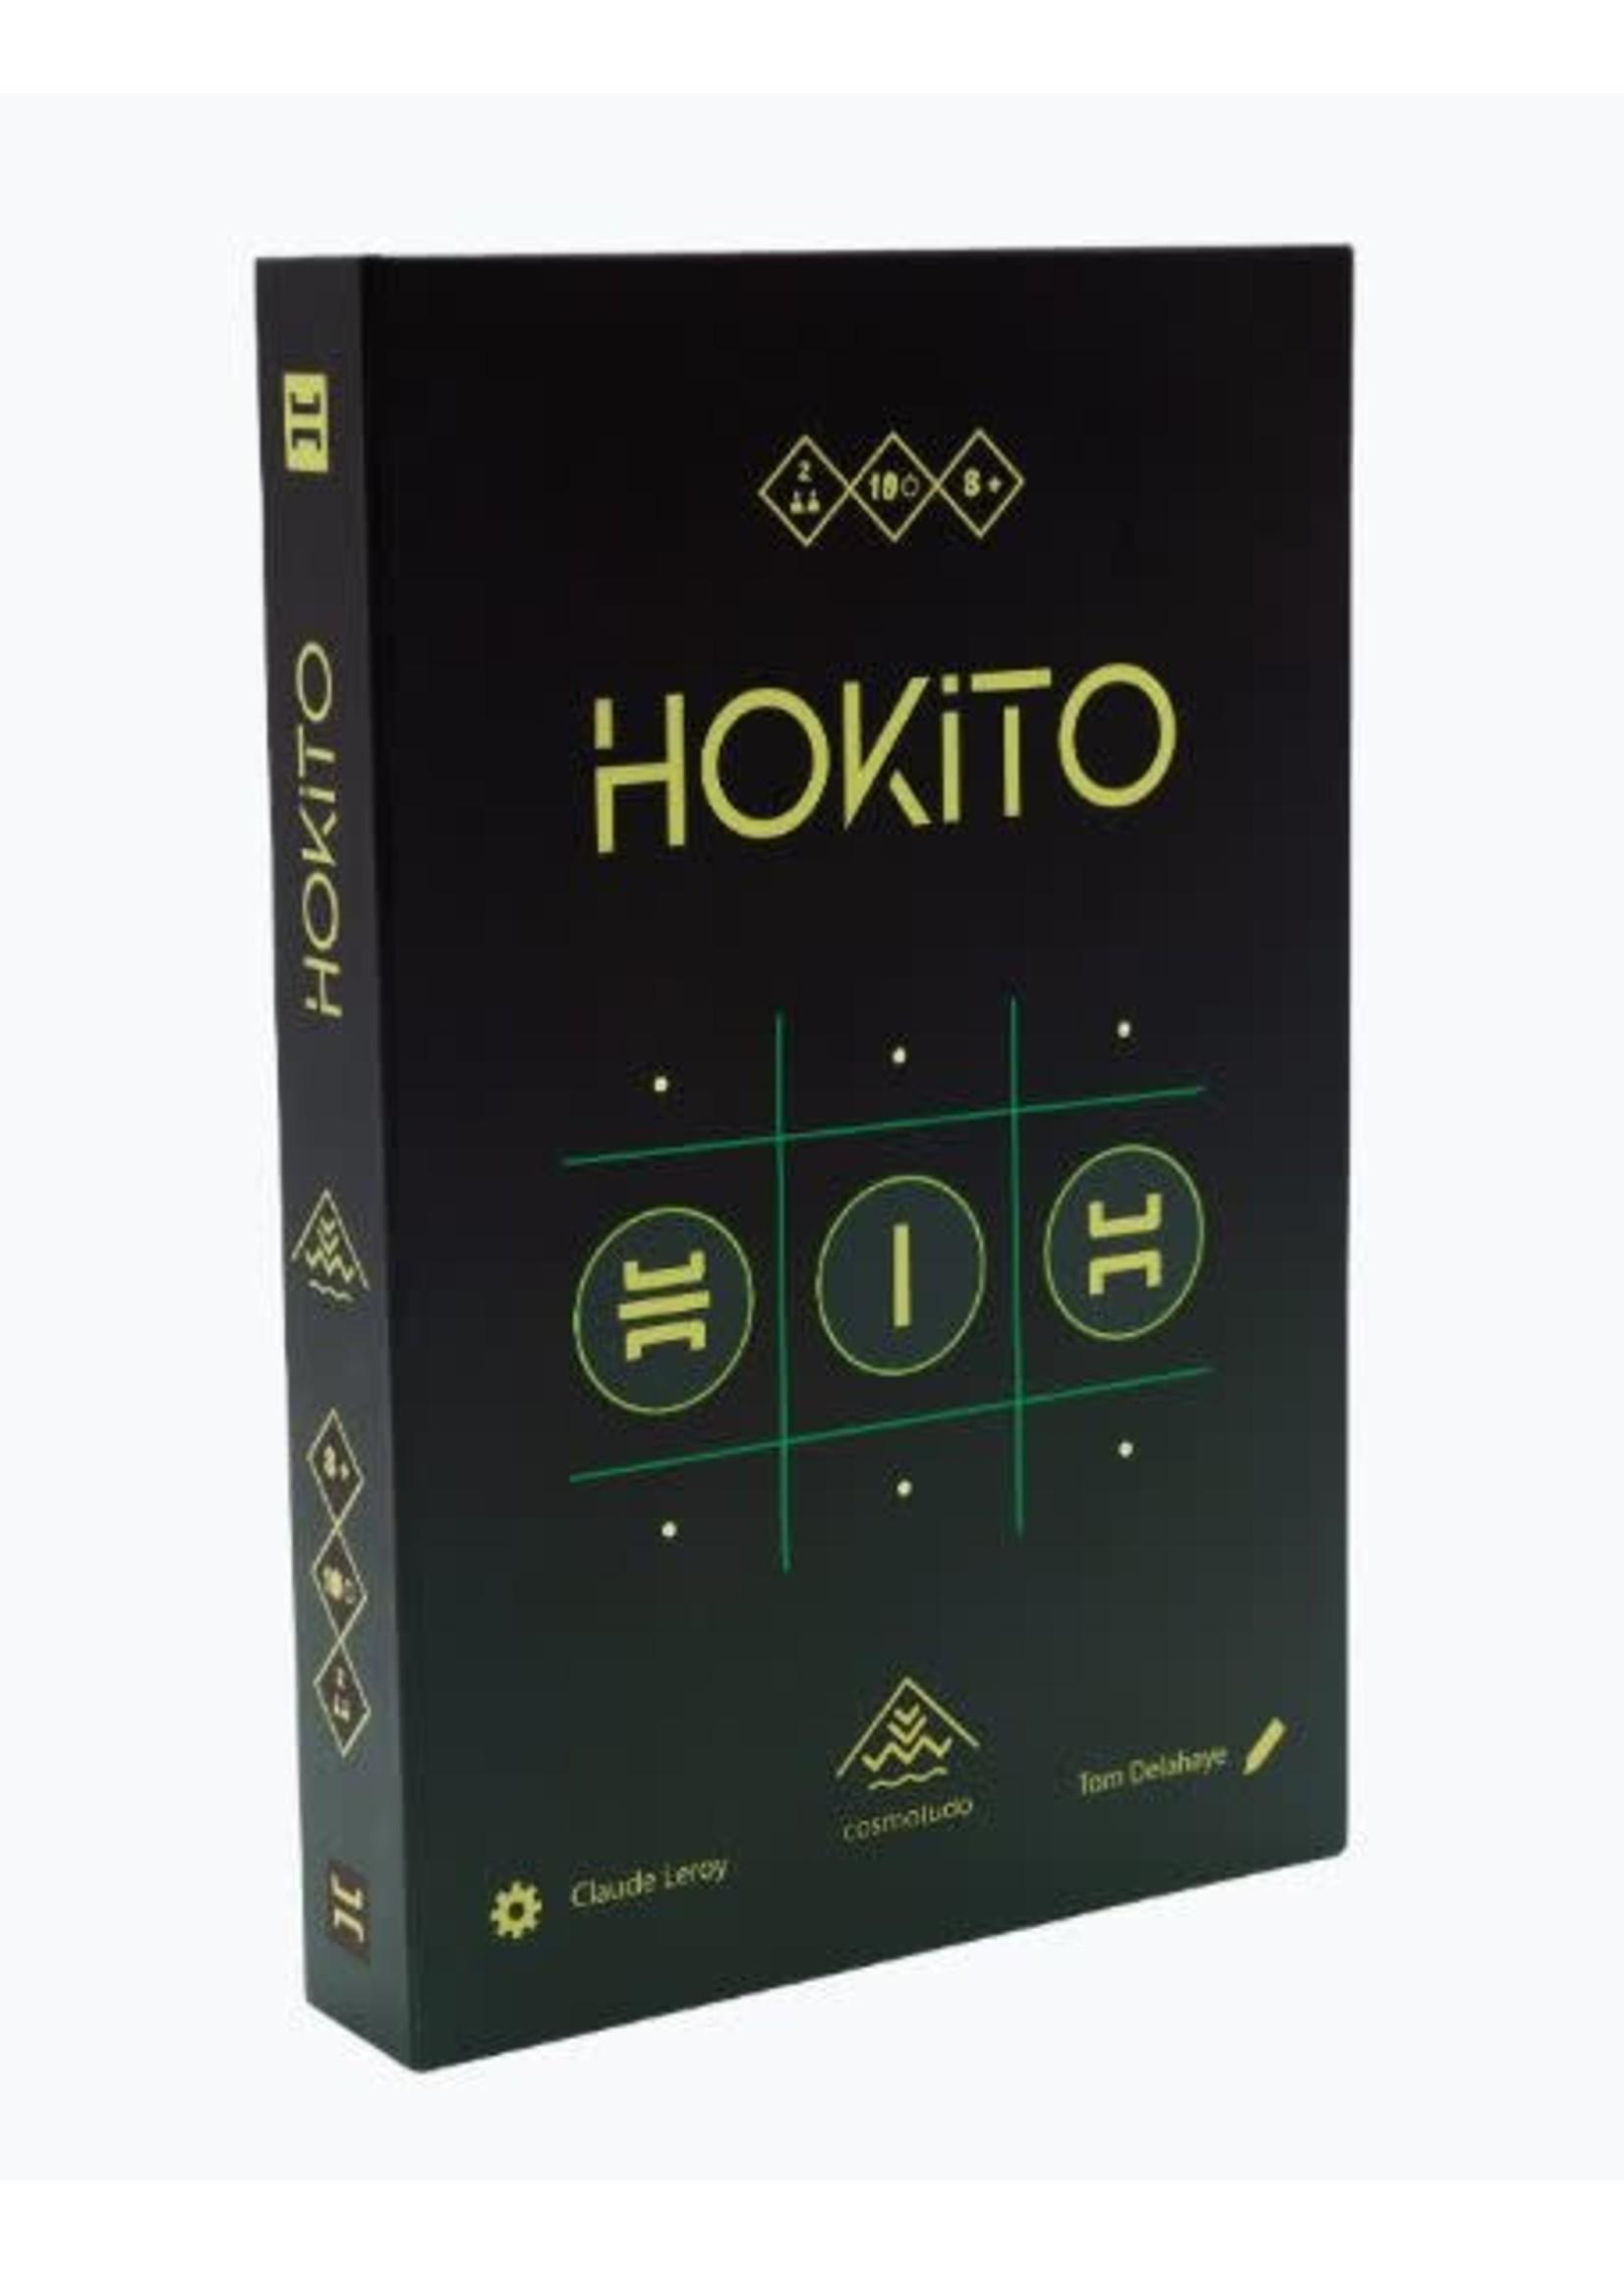 Hokito